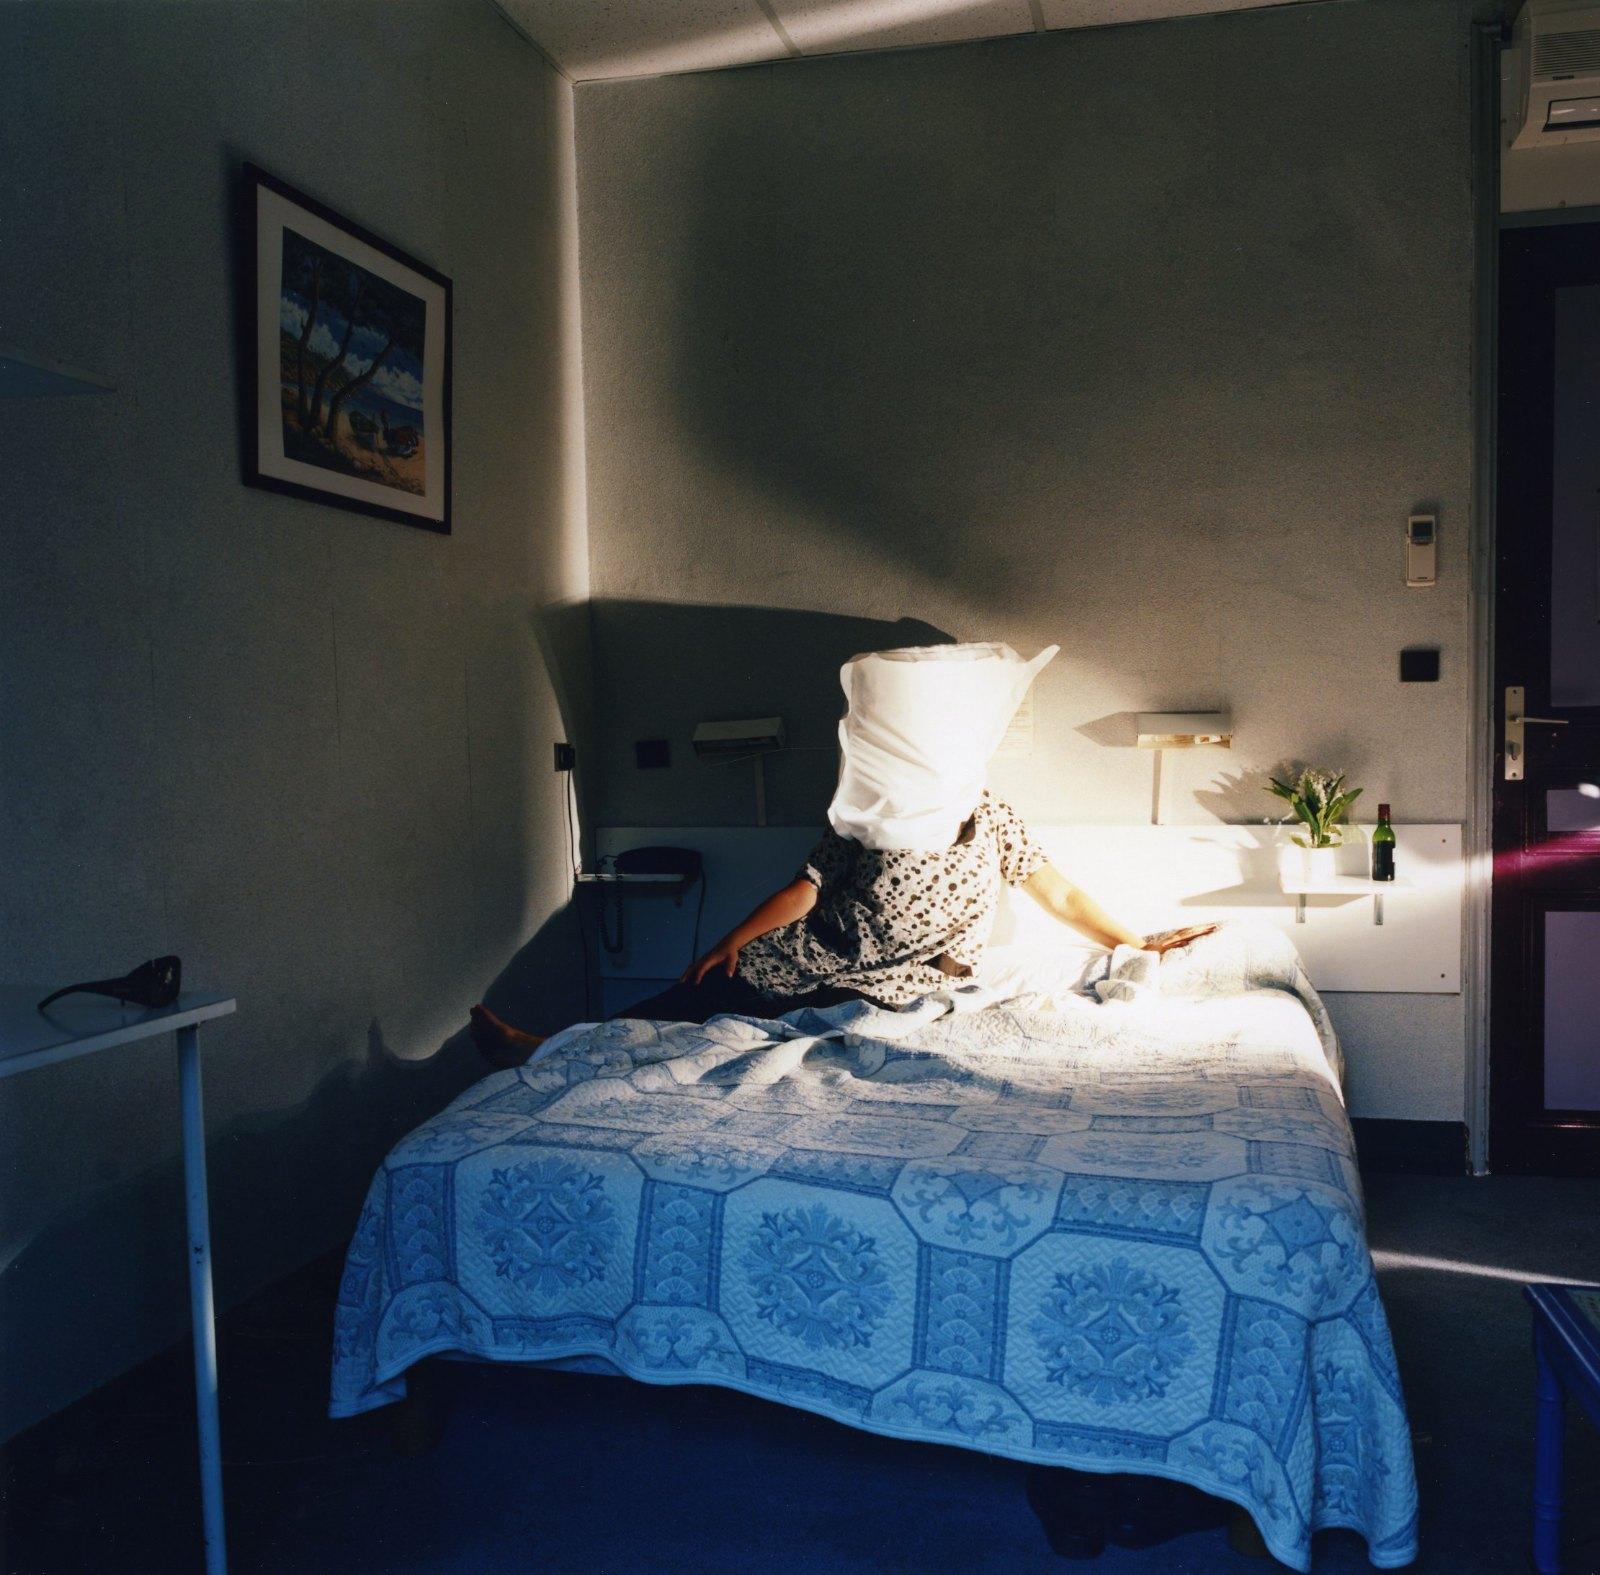 Hotel Mediterraneé 17:56, 2008, C-print, 65 x 65 cm